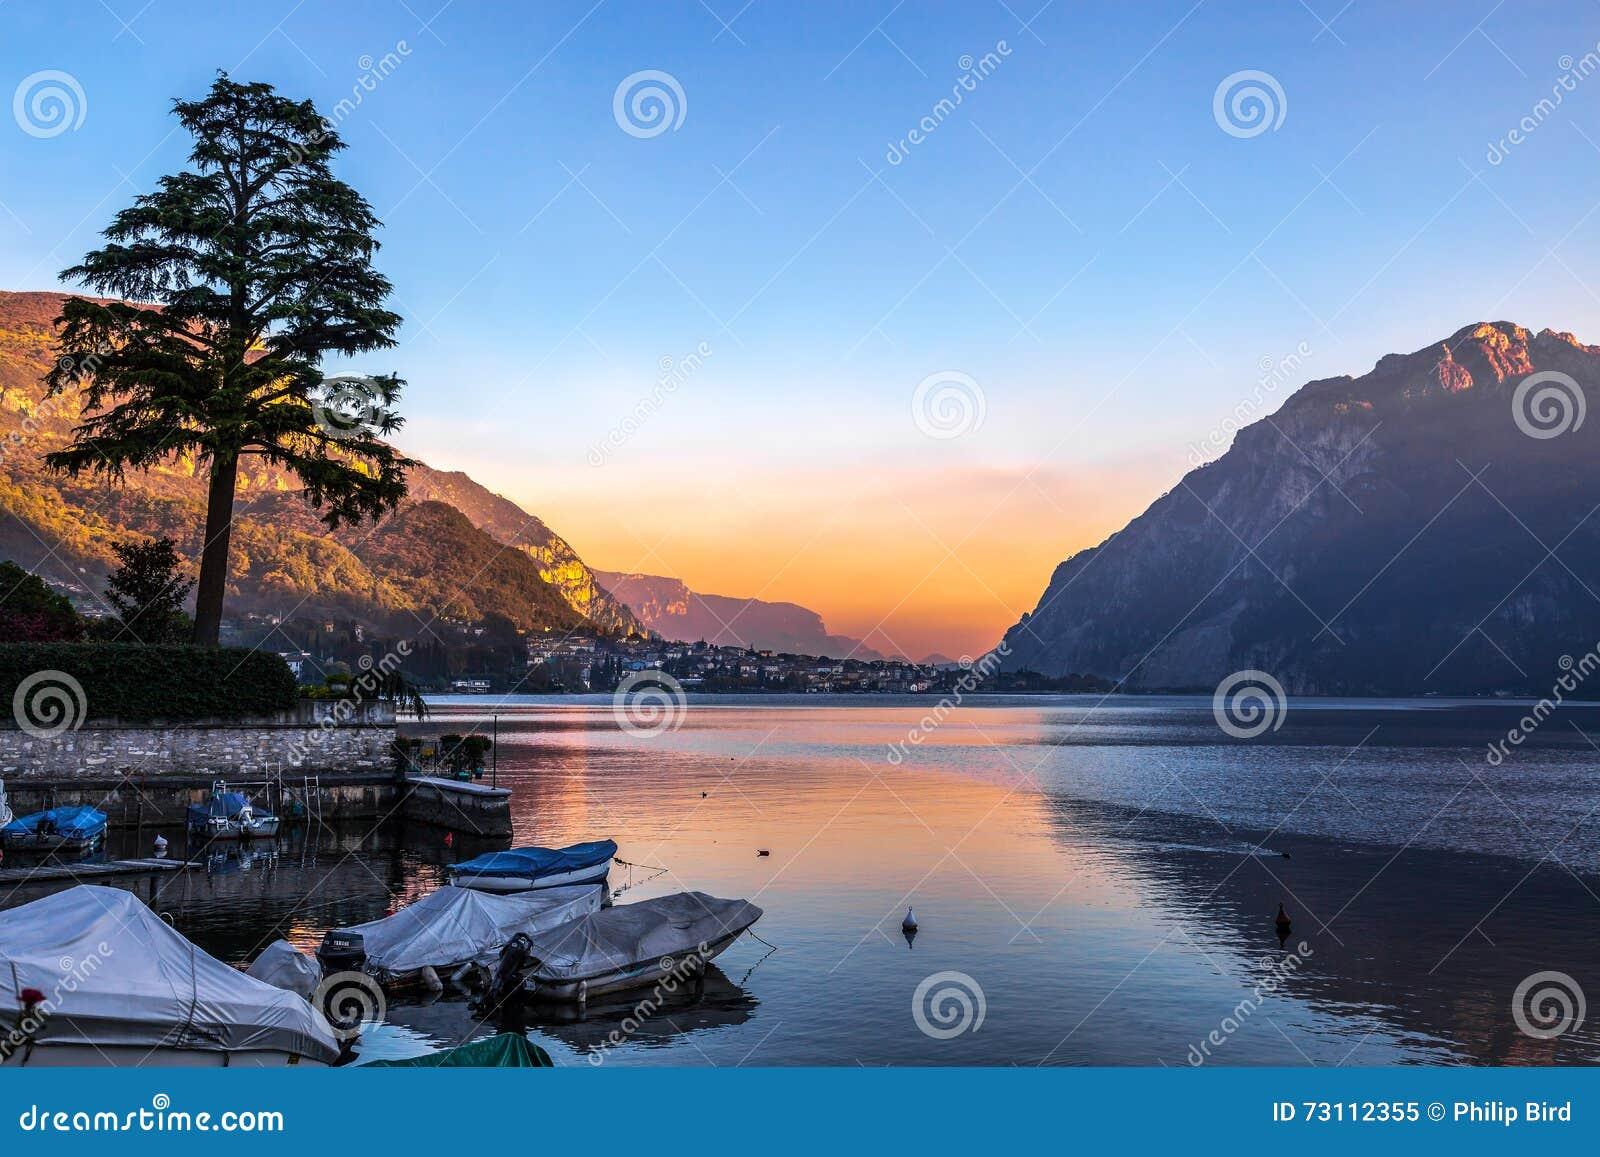 LAKE O ITALY EUROPE OCTOBER 29 Scenic View Lake o